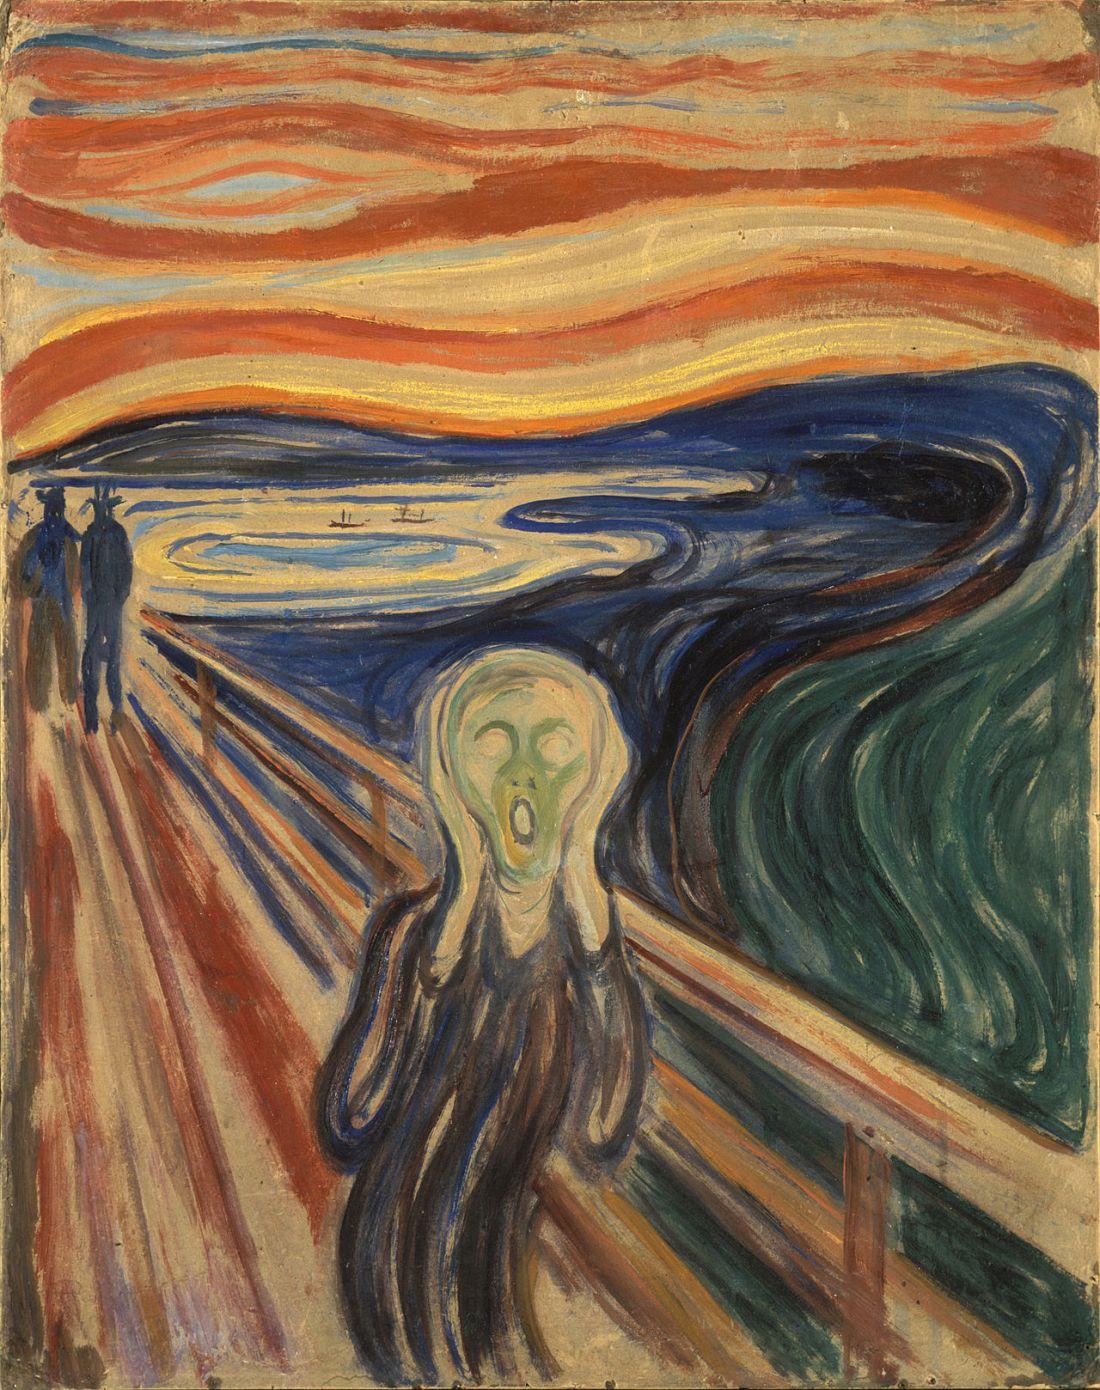 1280px-Edvard_Munch_-_The_Scream_-_Google_Art_Project